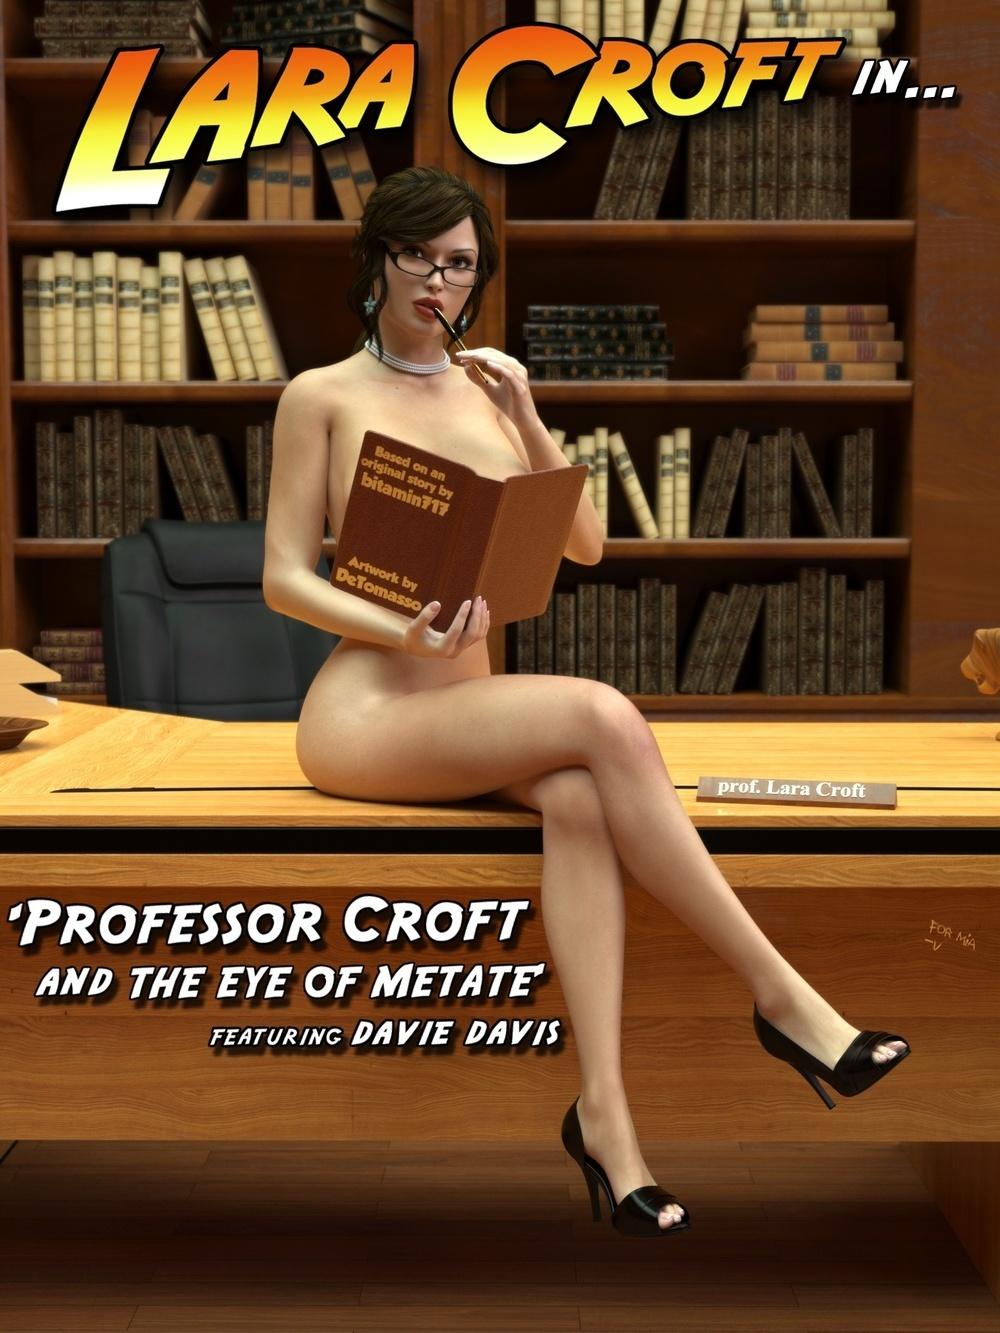 DETOMASSO ART – PROFESSOR CROFT AND EYE OF METAT